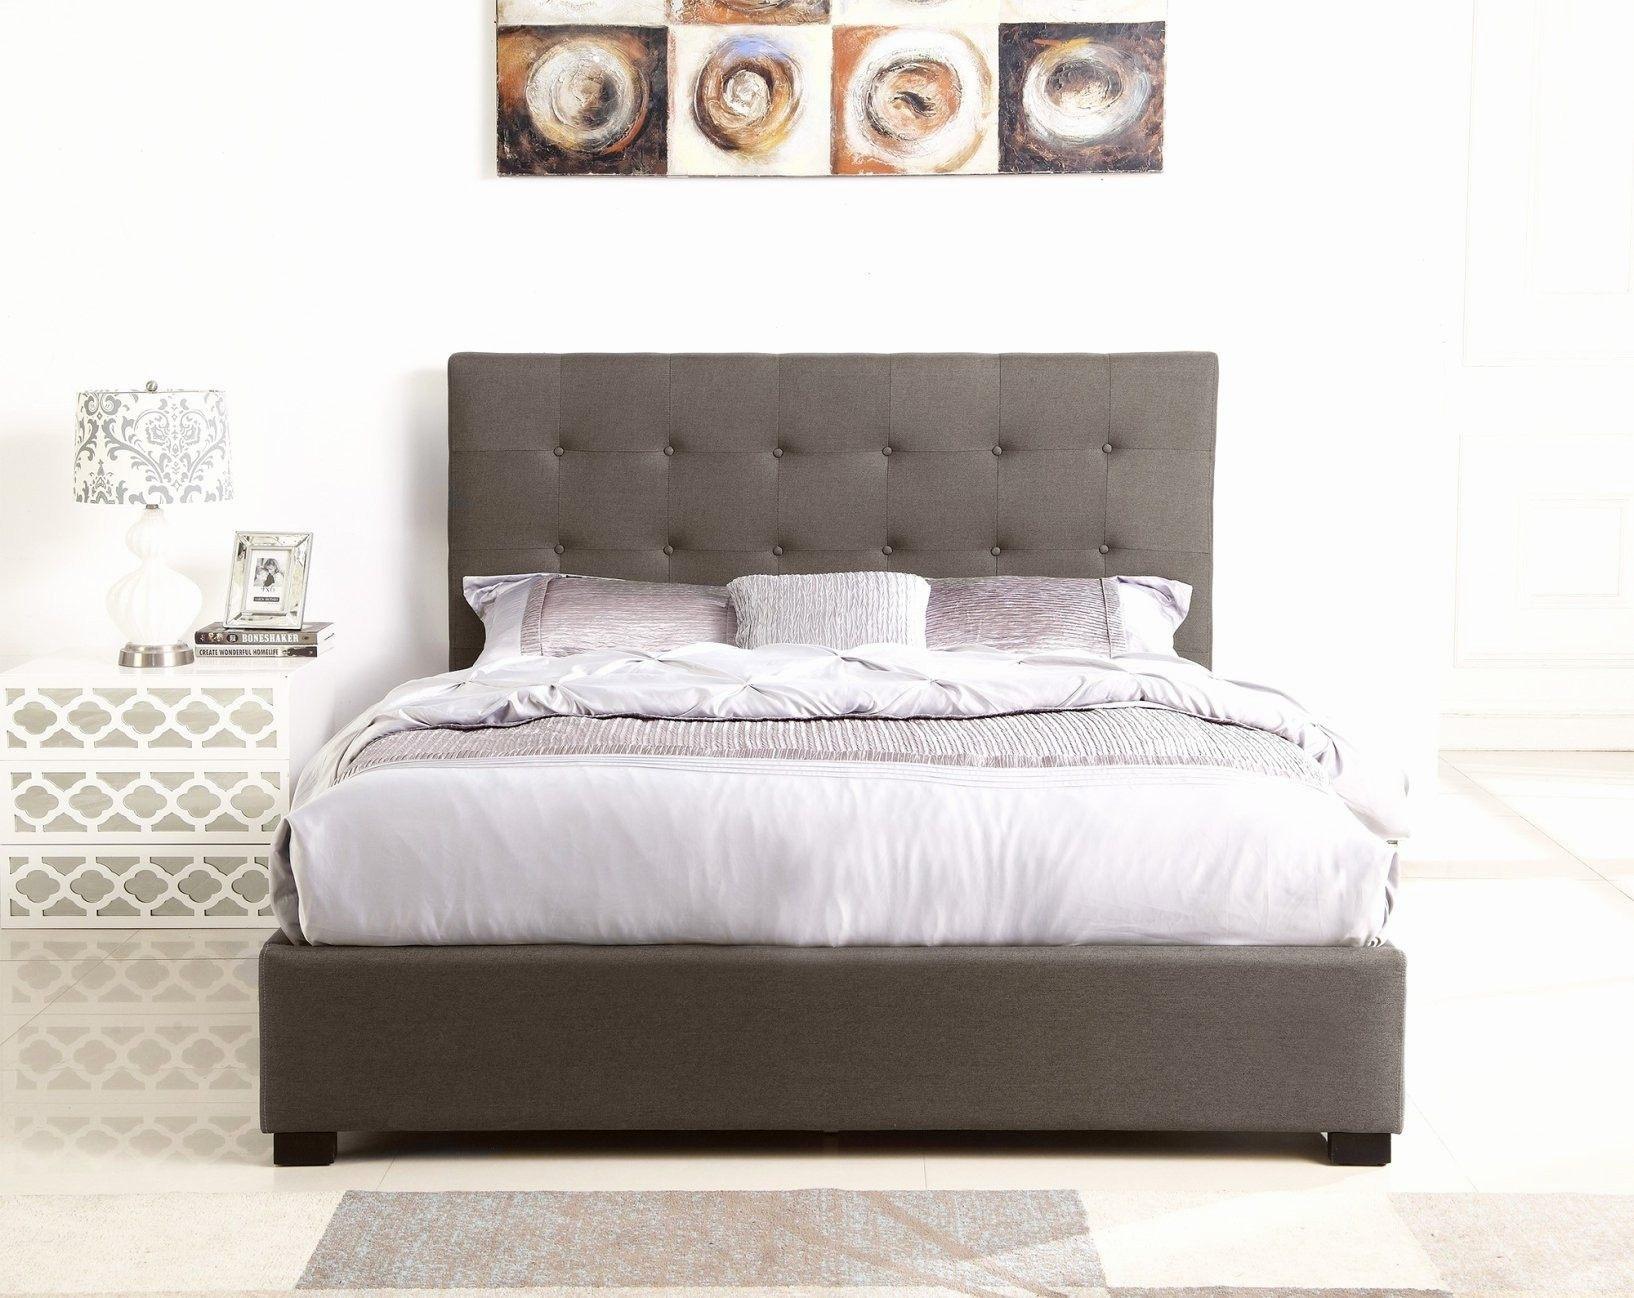 Tete De Lit Ikea Brimnes Unique Brimnes Bed with Storage Tete De Lit Ikea Brimnes Génial Nesttun Bed